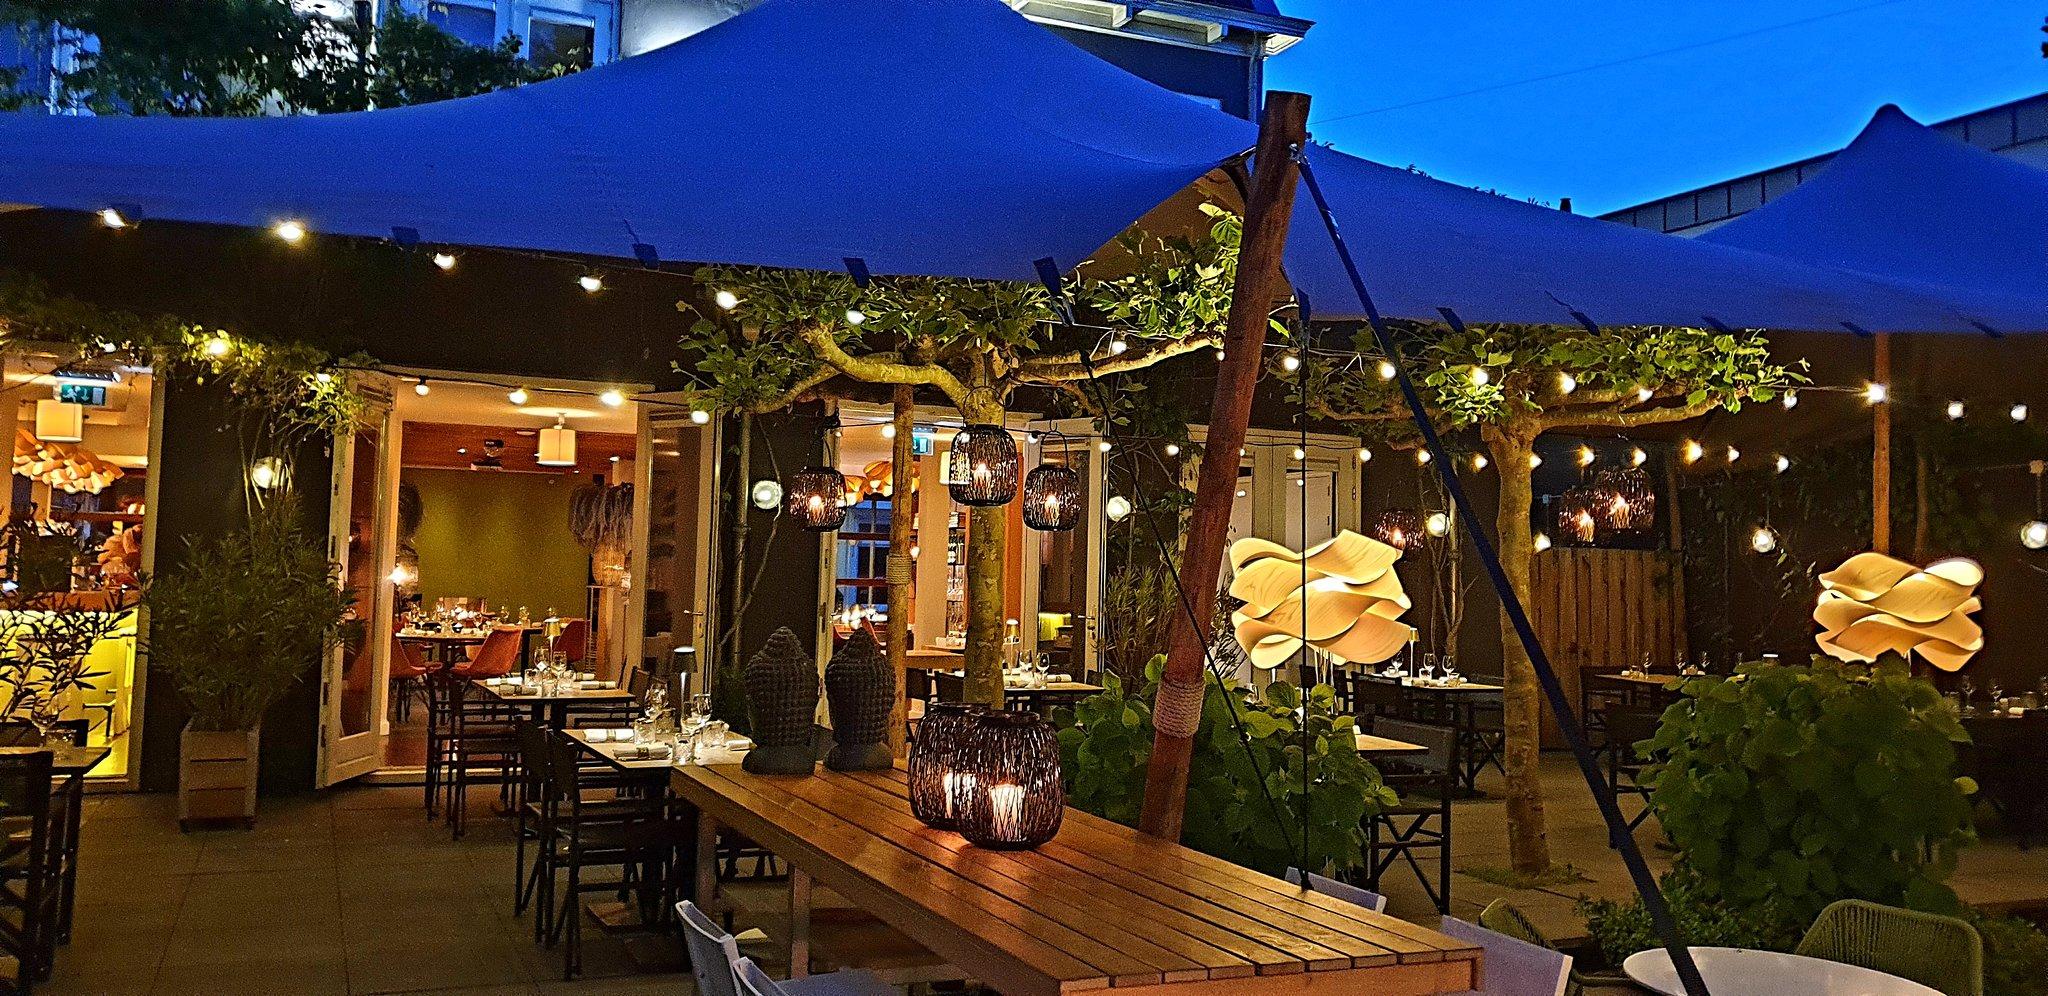 tuin a la carte overzicht richting restaurant - kopie